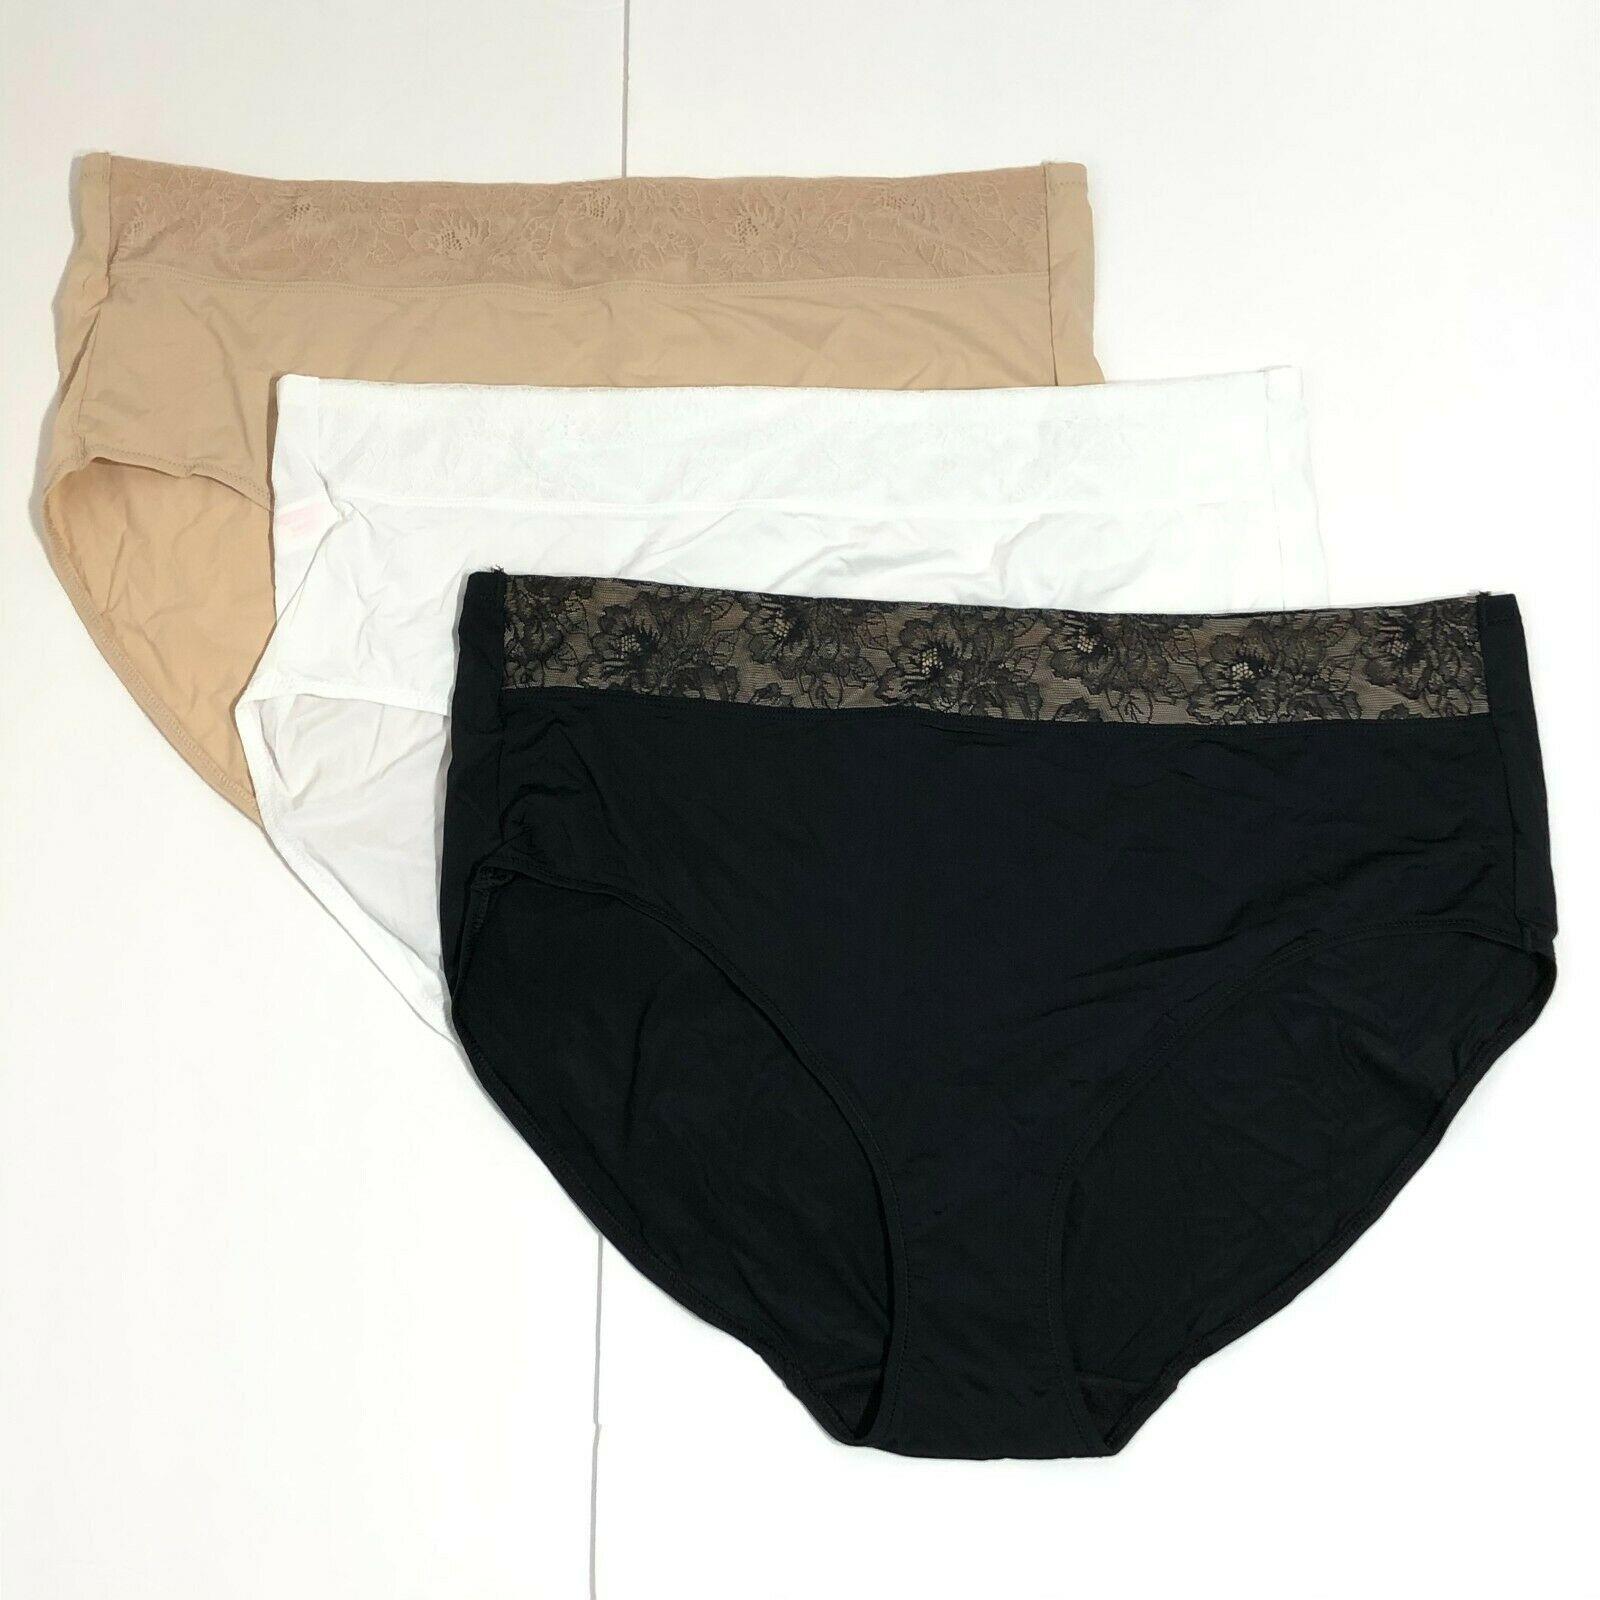 Breezies Protective Panties Pic